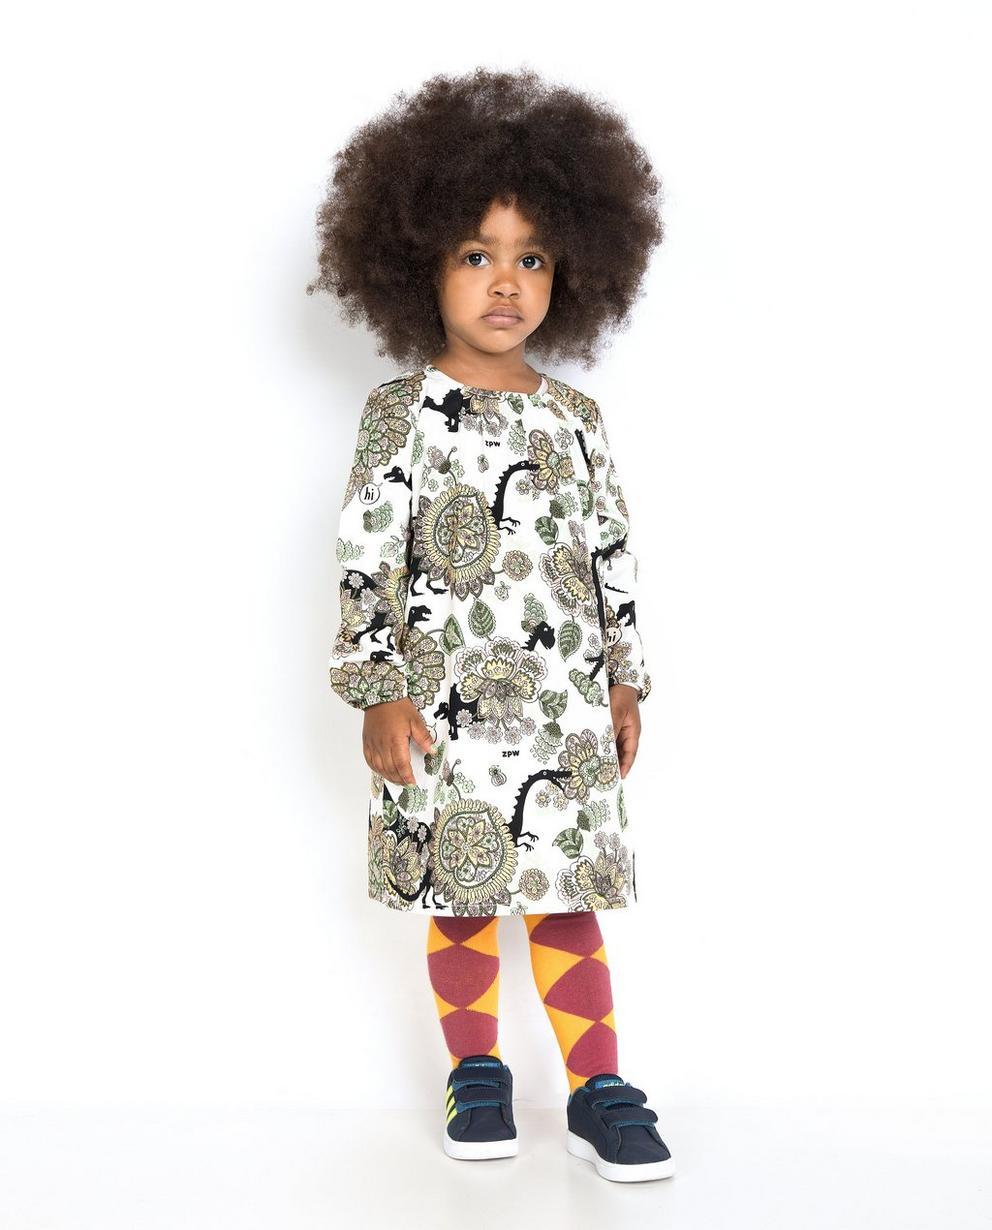 Robe avec imprimé - ZulupaPUWA - Unisexe - ZulupaPUWA